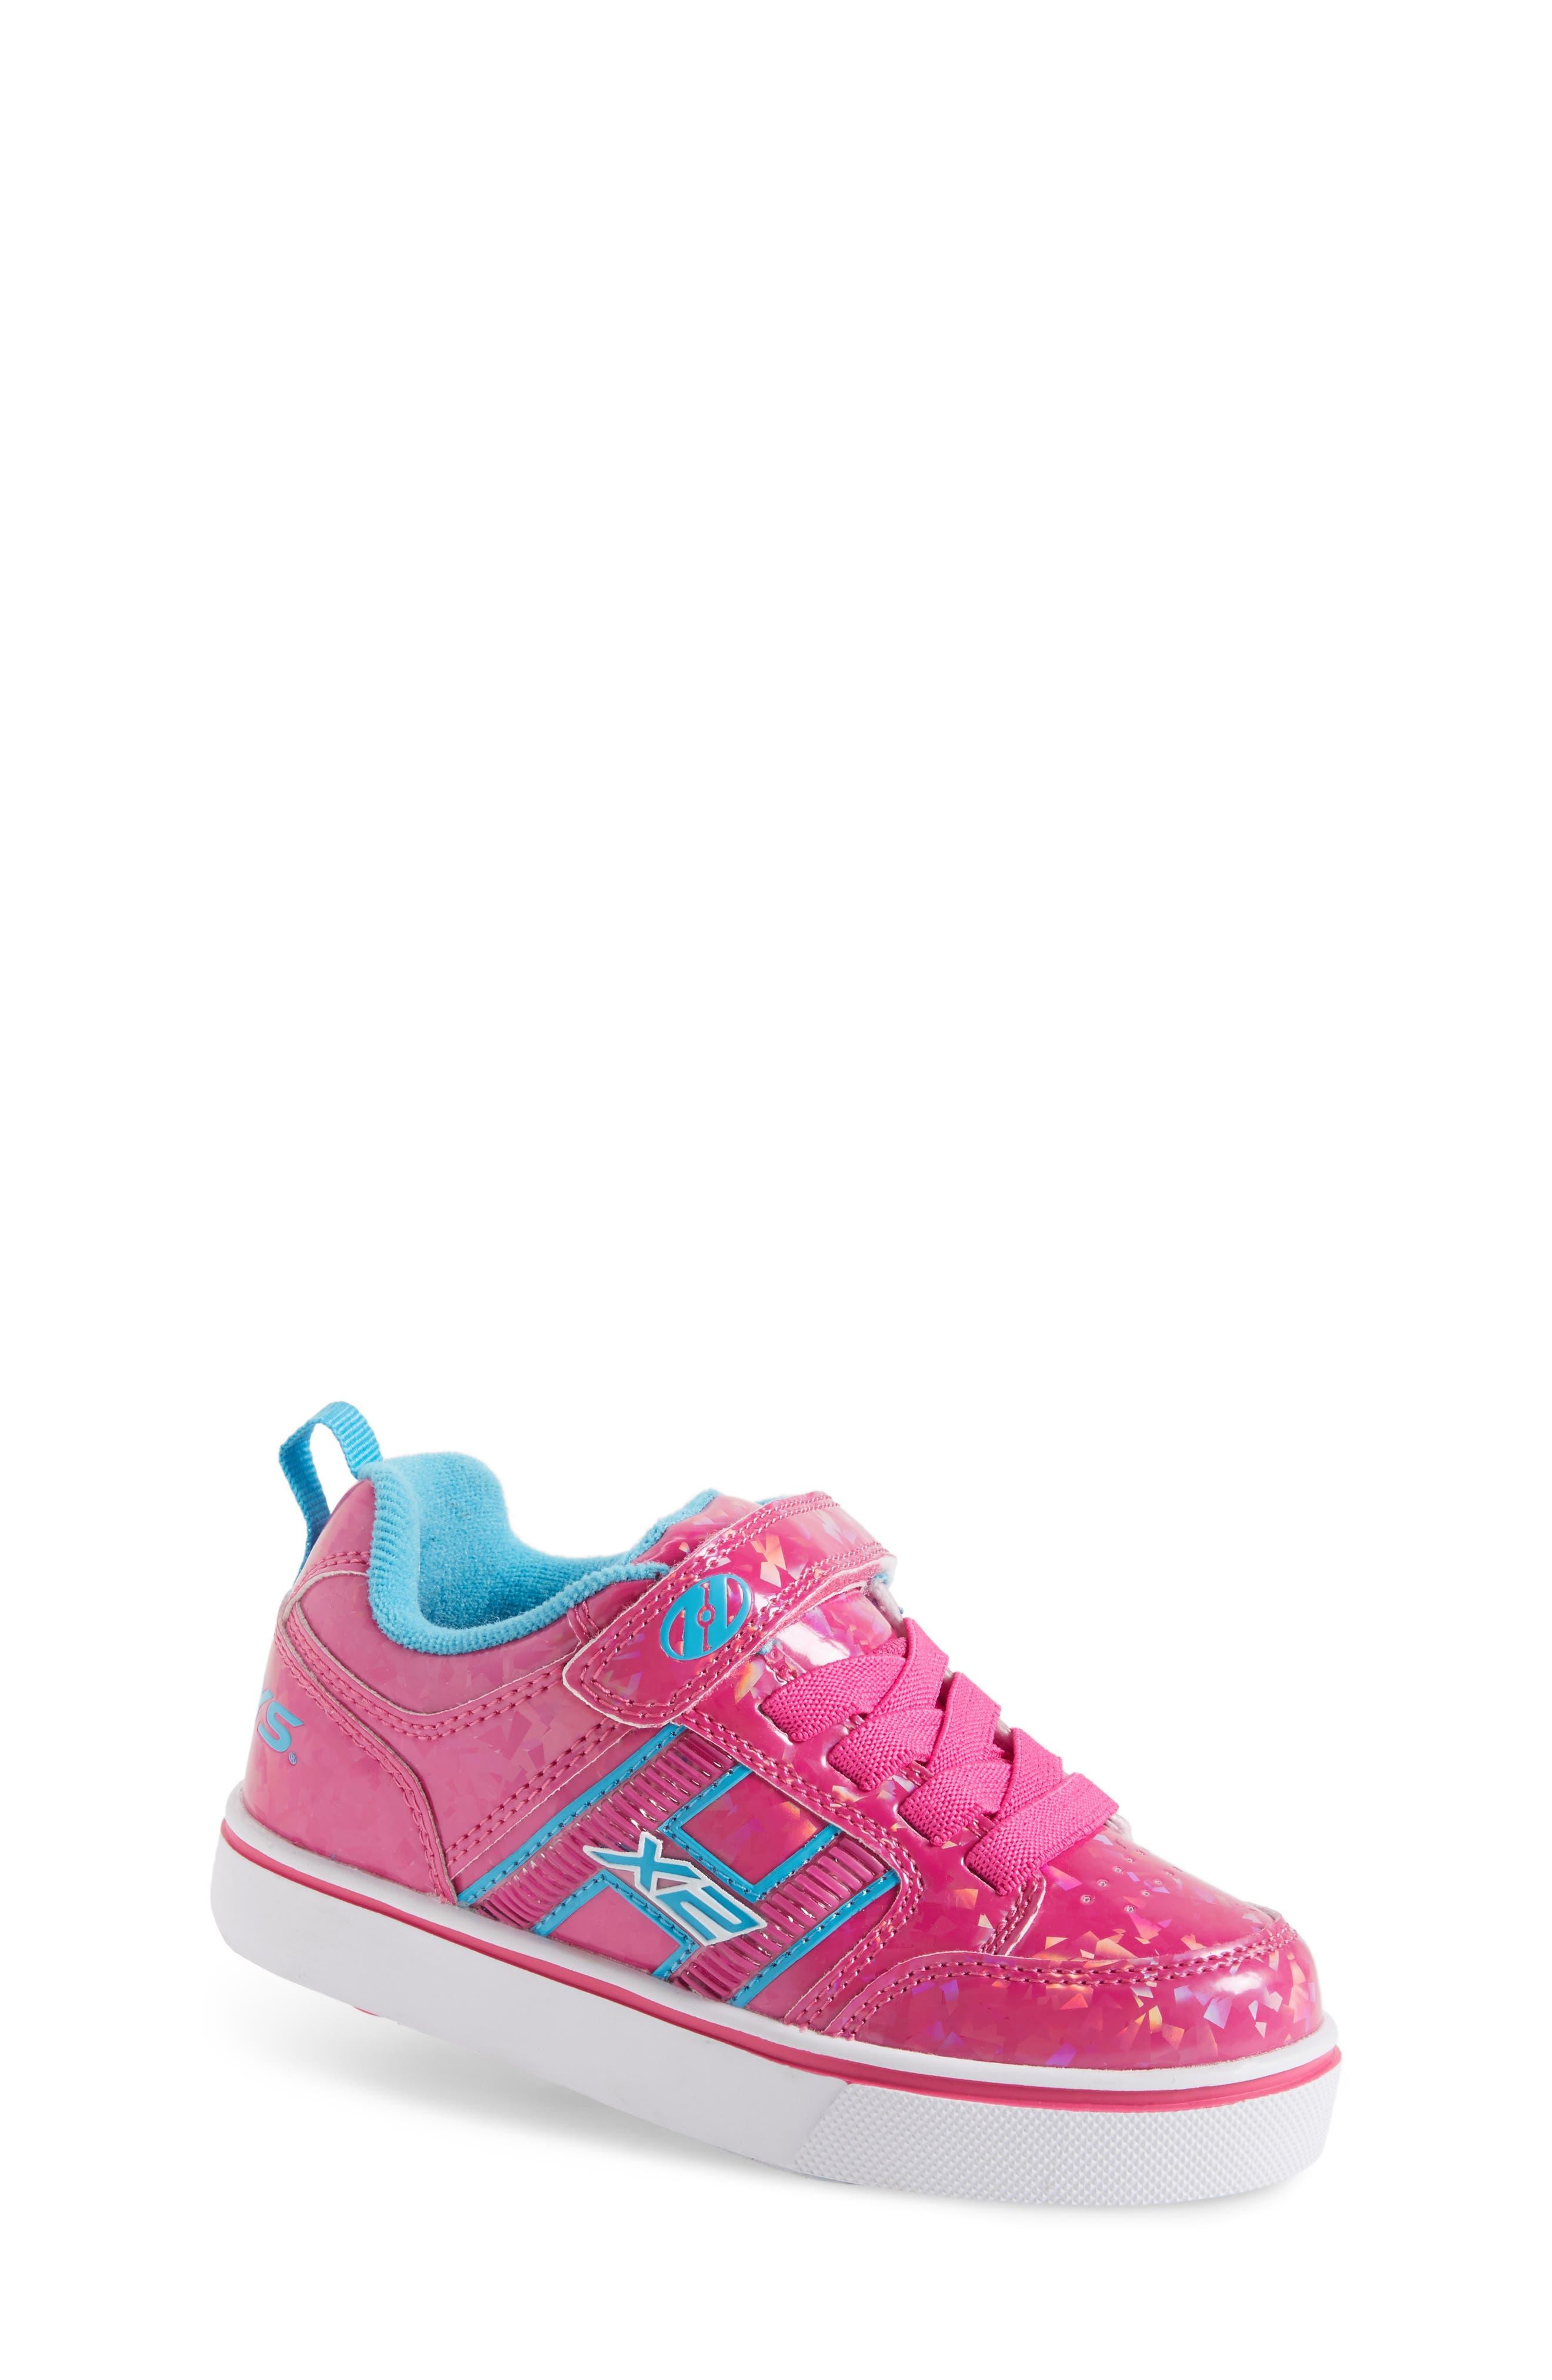 Main Image - Heelys Bolt Plus X2 Light-Up Skate Sneaker (Toddler, Little Kid & Big Kid)